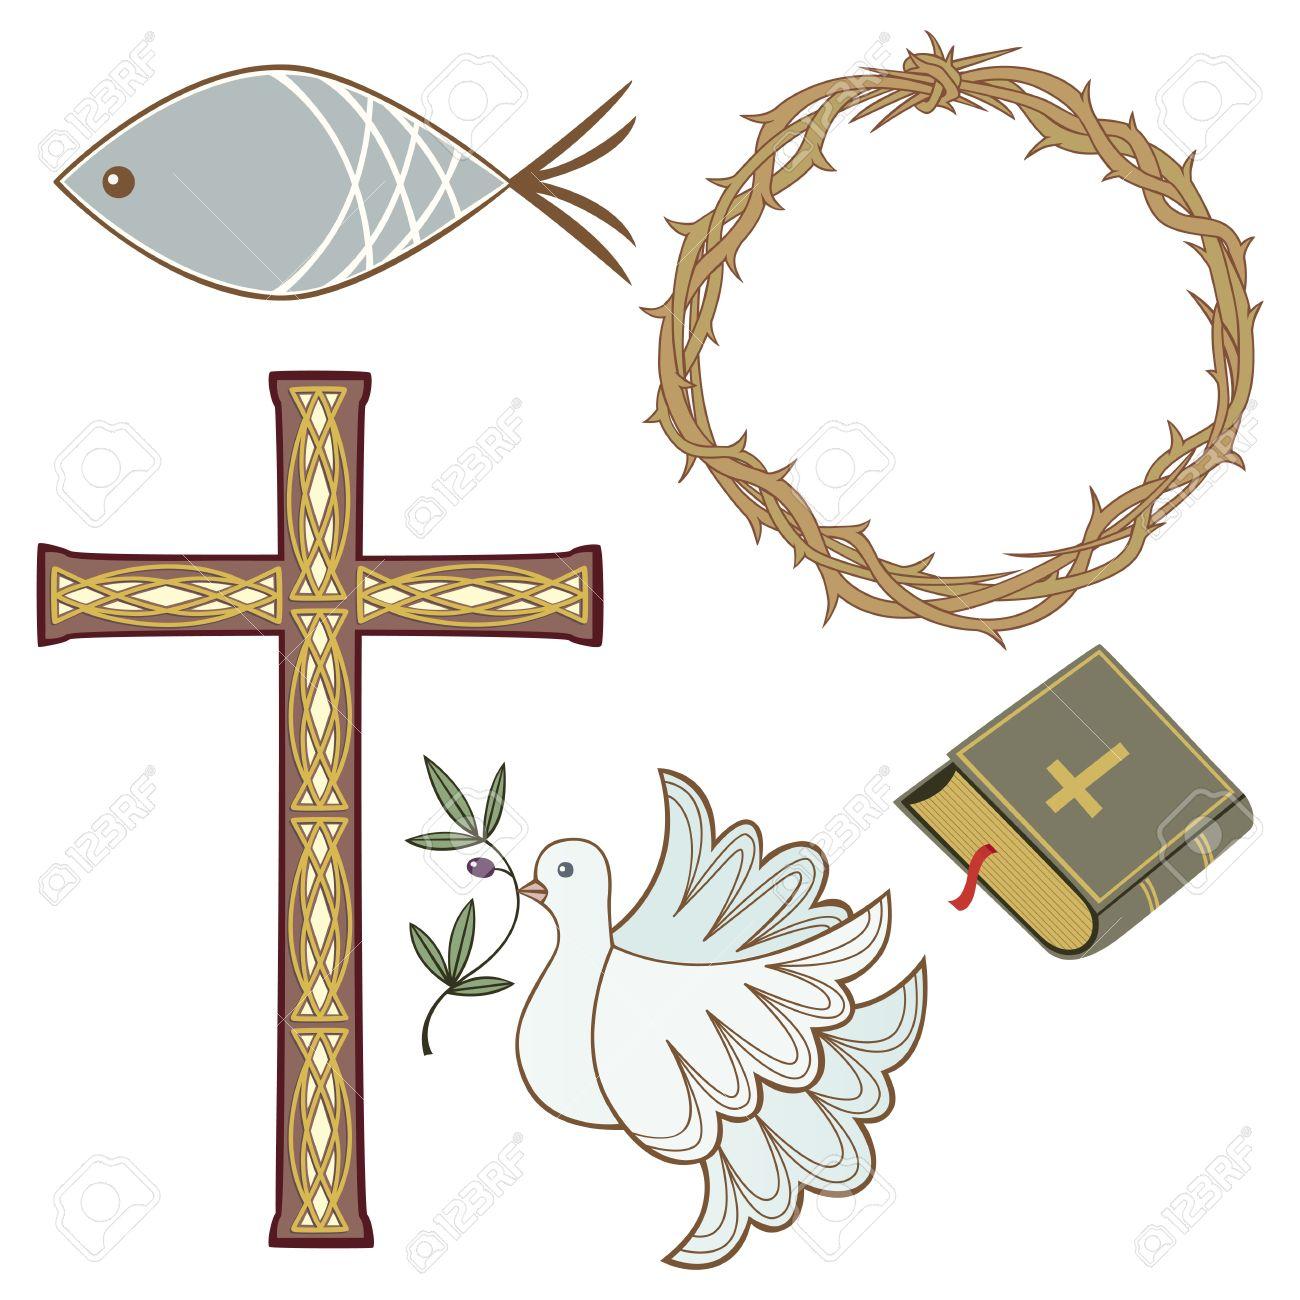 Collection of 5 different christian symbols royalty free cliparts collection of 5 different christian symbols stock vector 9544044 buycottarizona